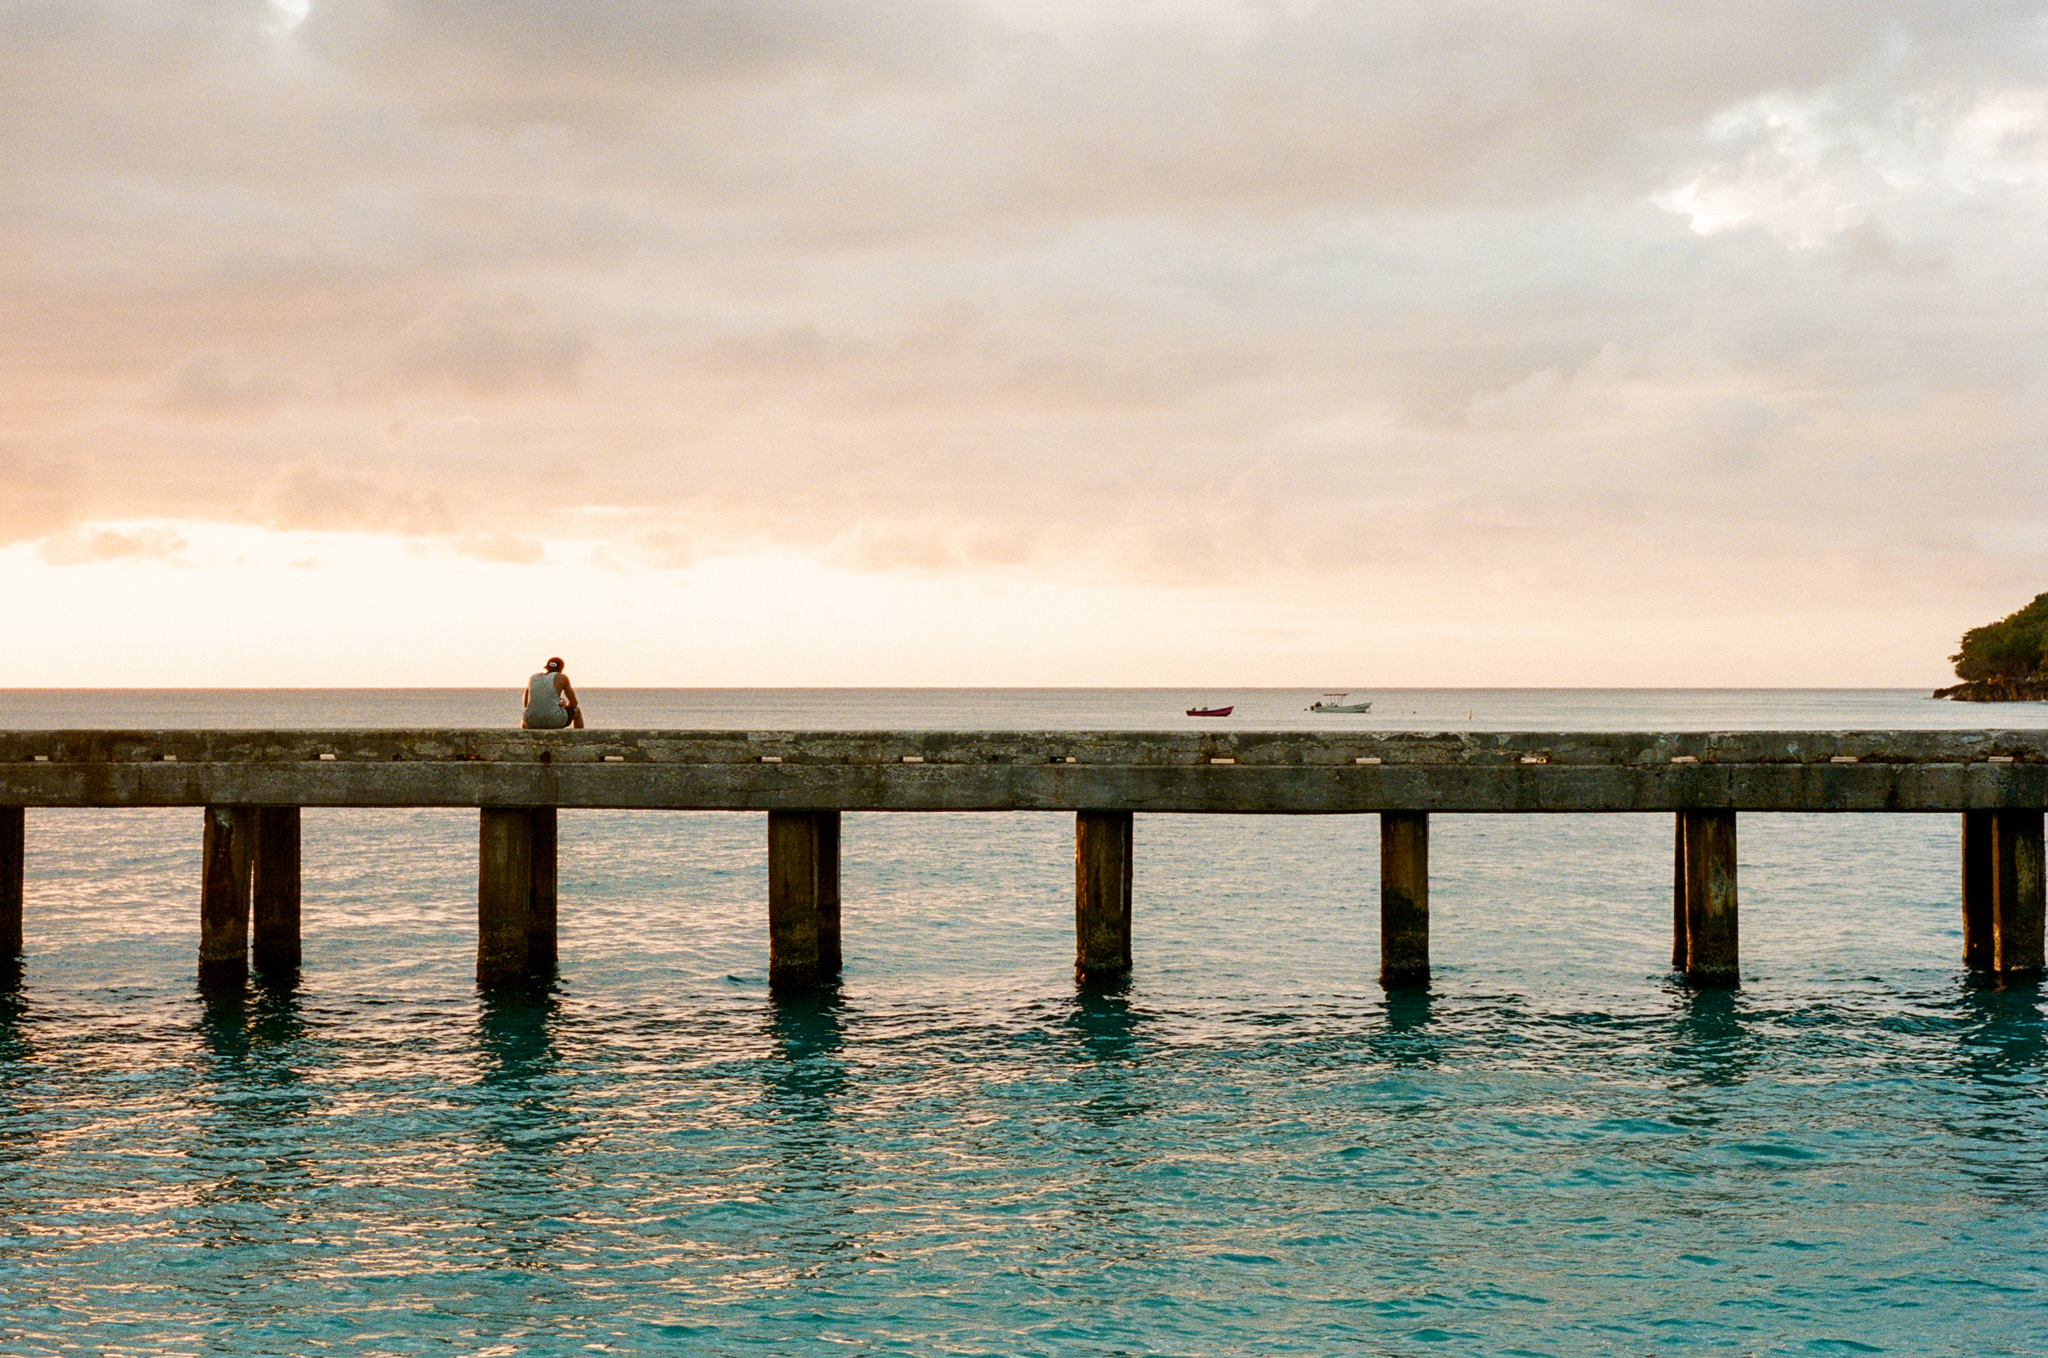 Crashboat | Leica M5 | Zeiss Planar 50mm Portra 800 | Alexander Bendo